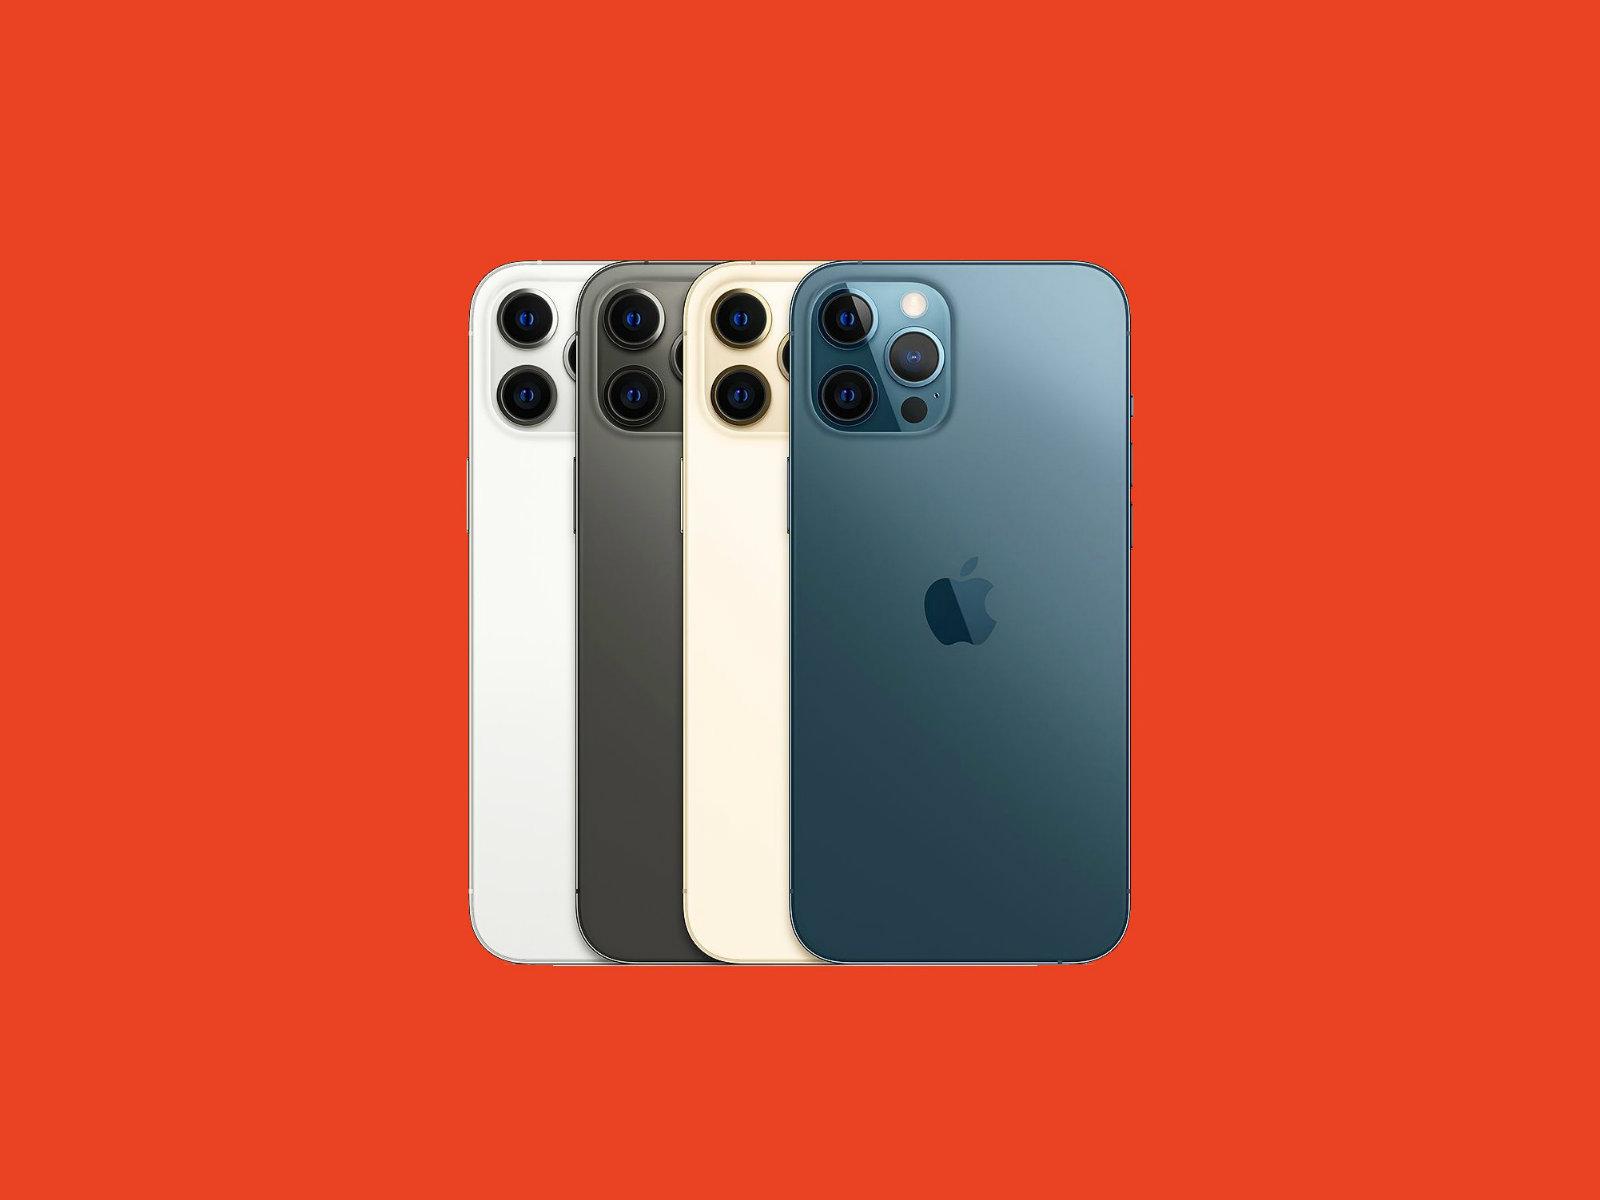 Apple iPhone 12 Pro Max w1600